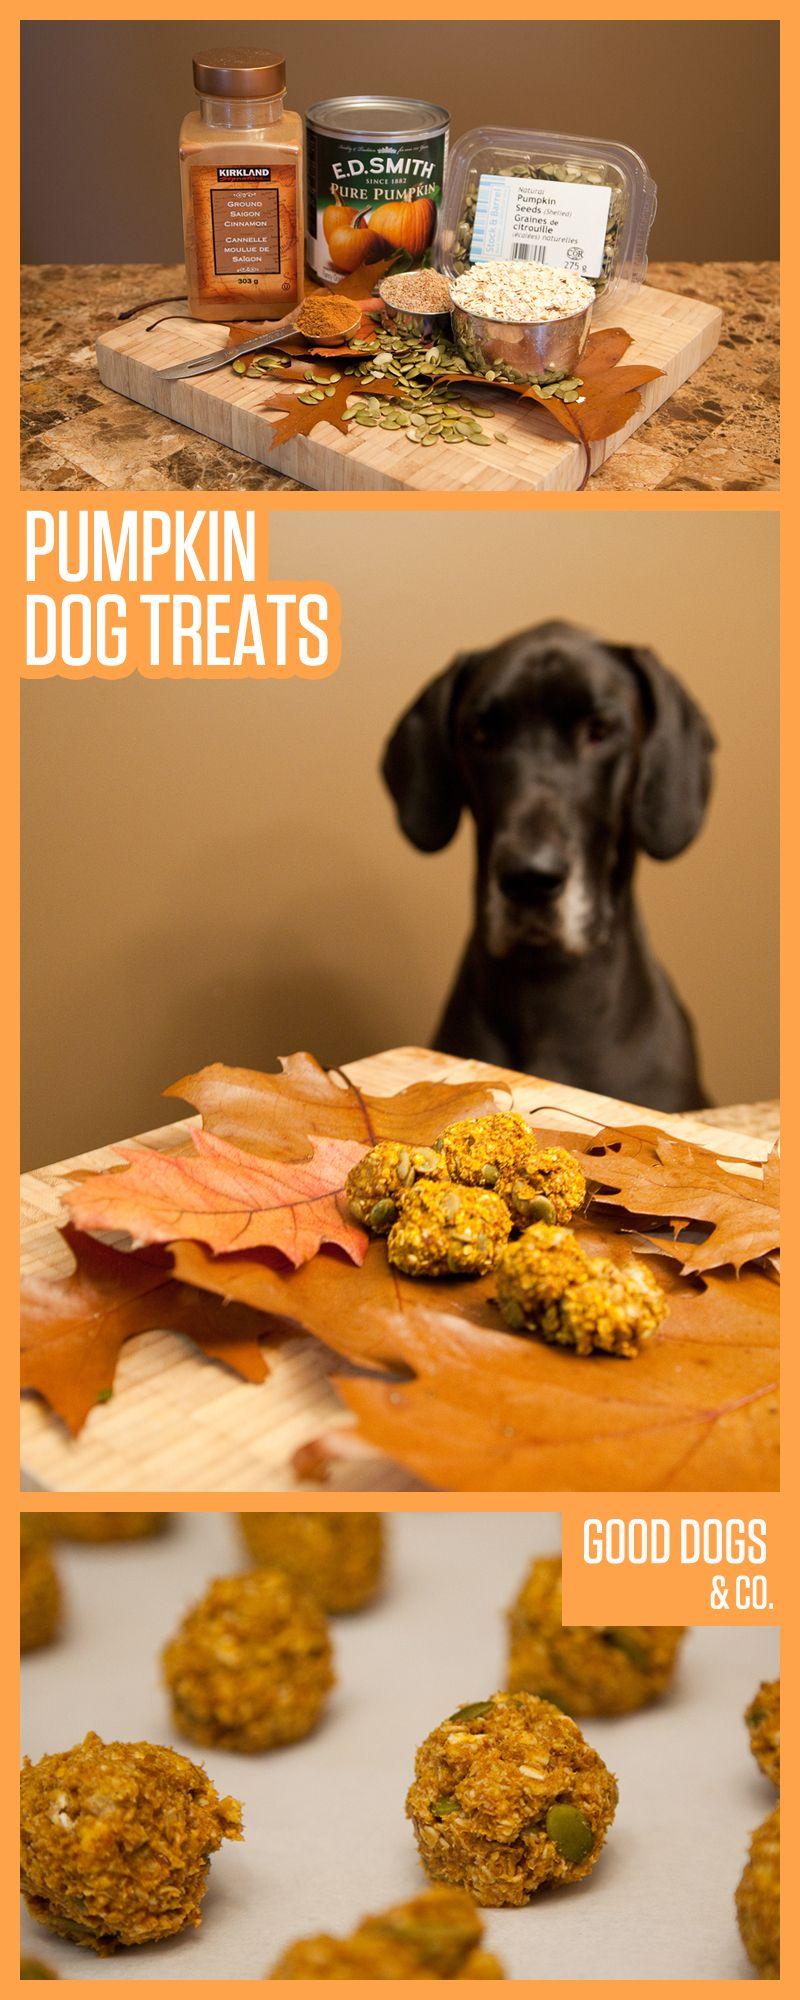 pumpkin dog treats did you know pumpkin puree and pumpkin seeds